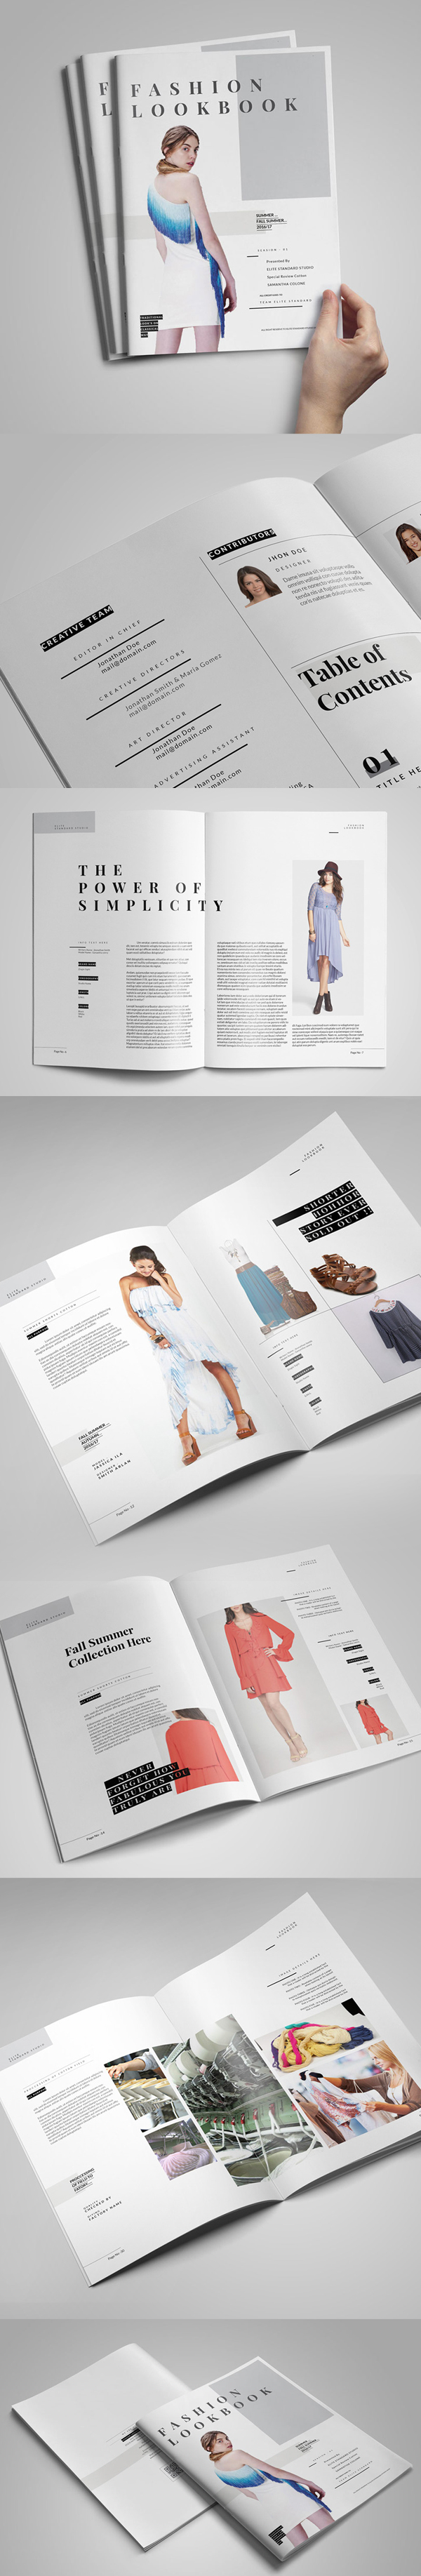 Minimal Fashion Look book / Catalog Template